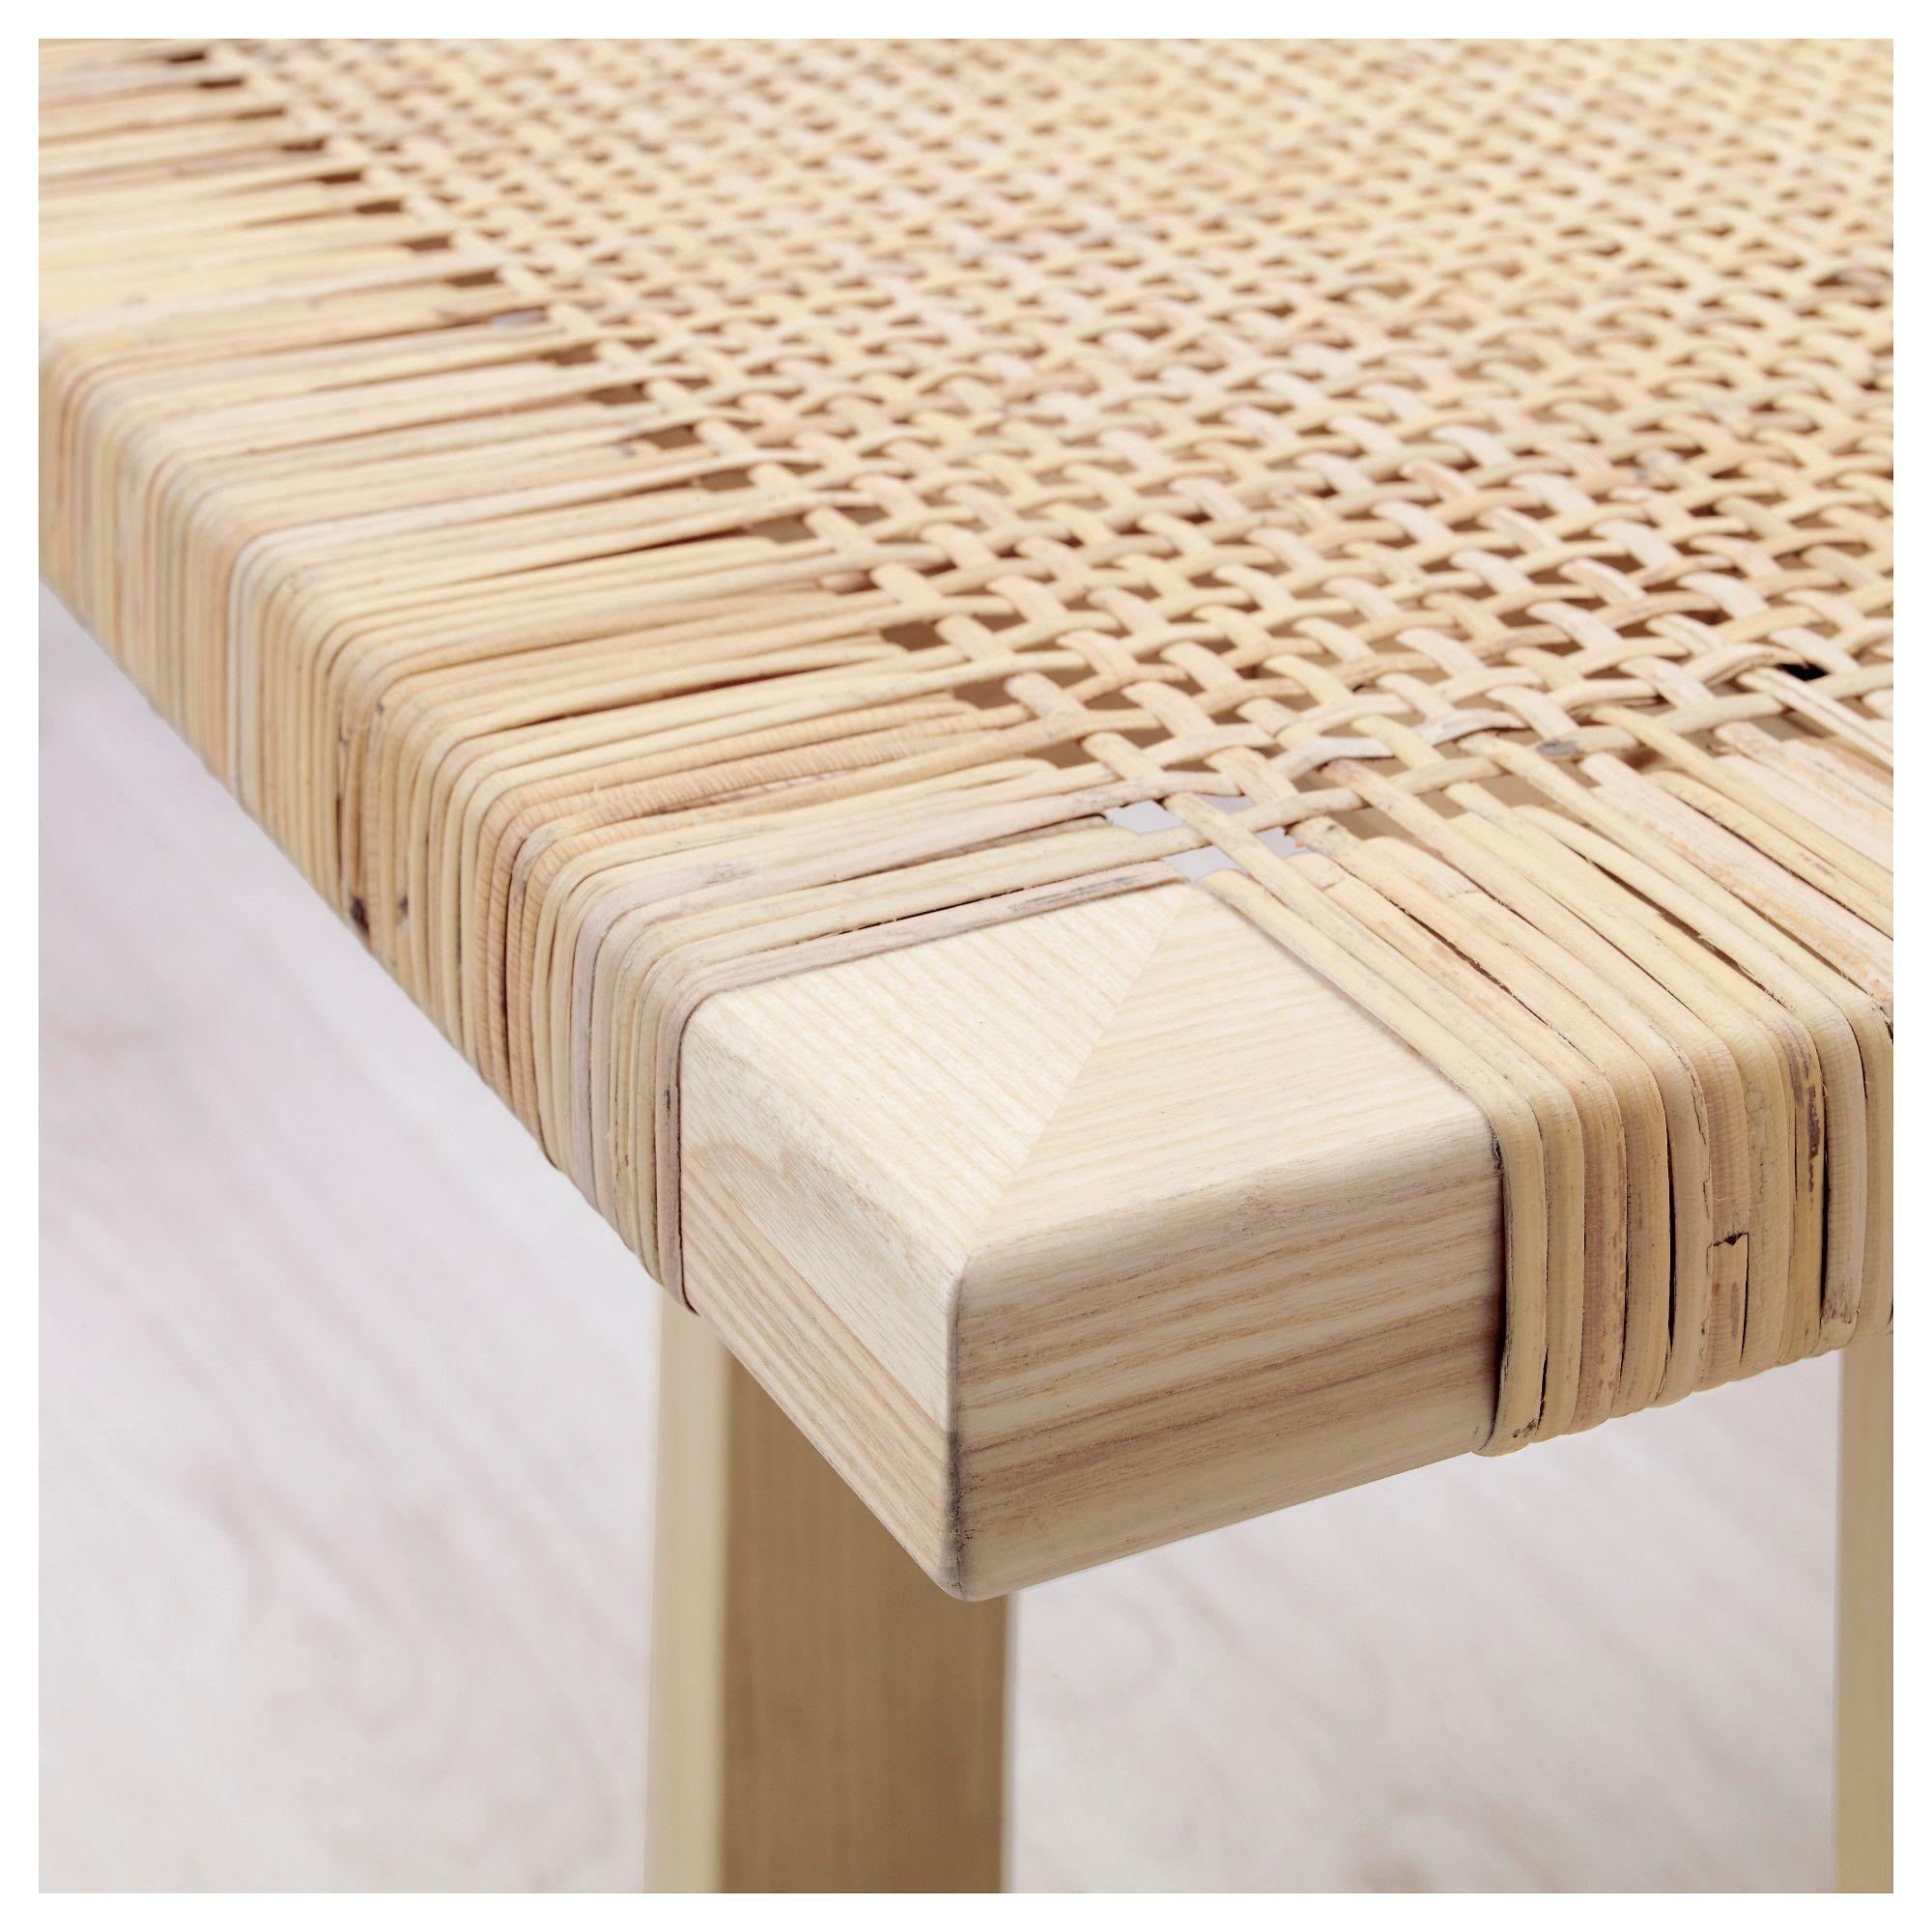 Us Furniture And Home Furnishings Ikea Stockholm 2017 Rattan